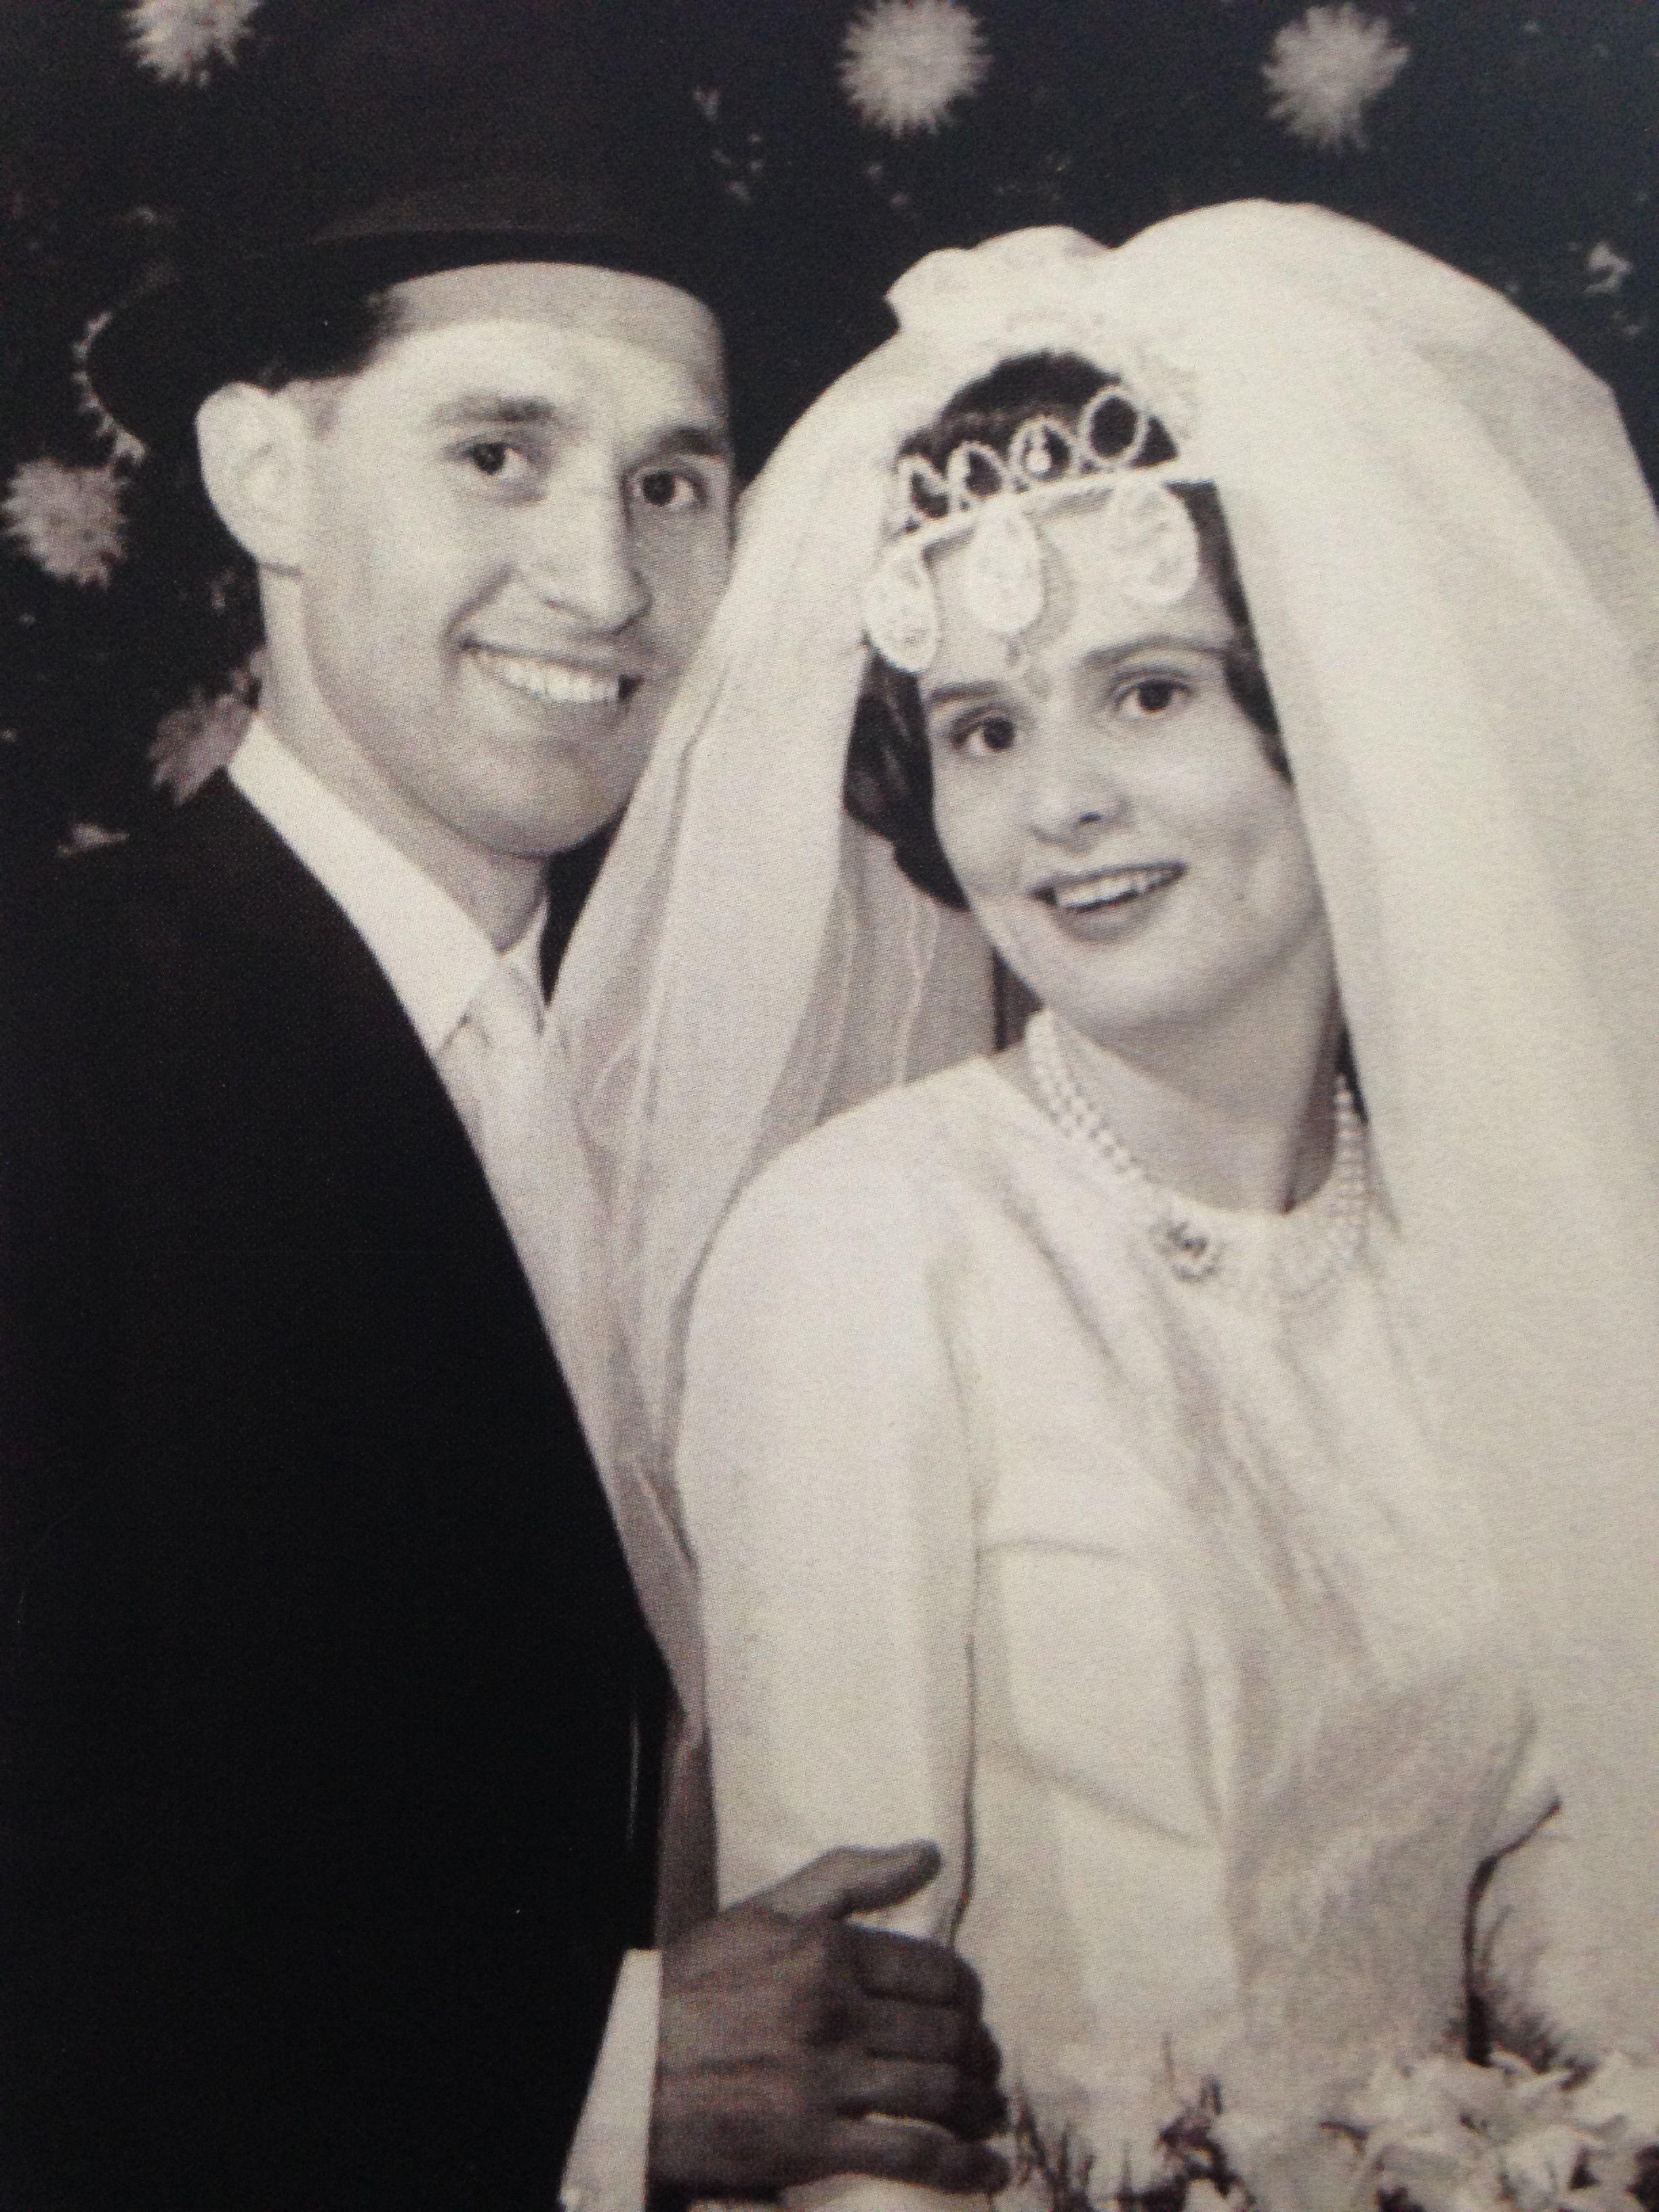 1960 wedding dresses  Pin by Jolanda Cornelisse on Daar komt de bruid   Pinterest